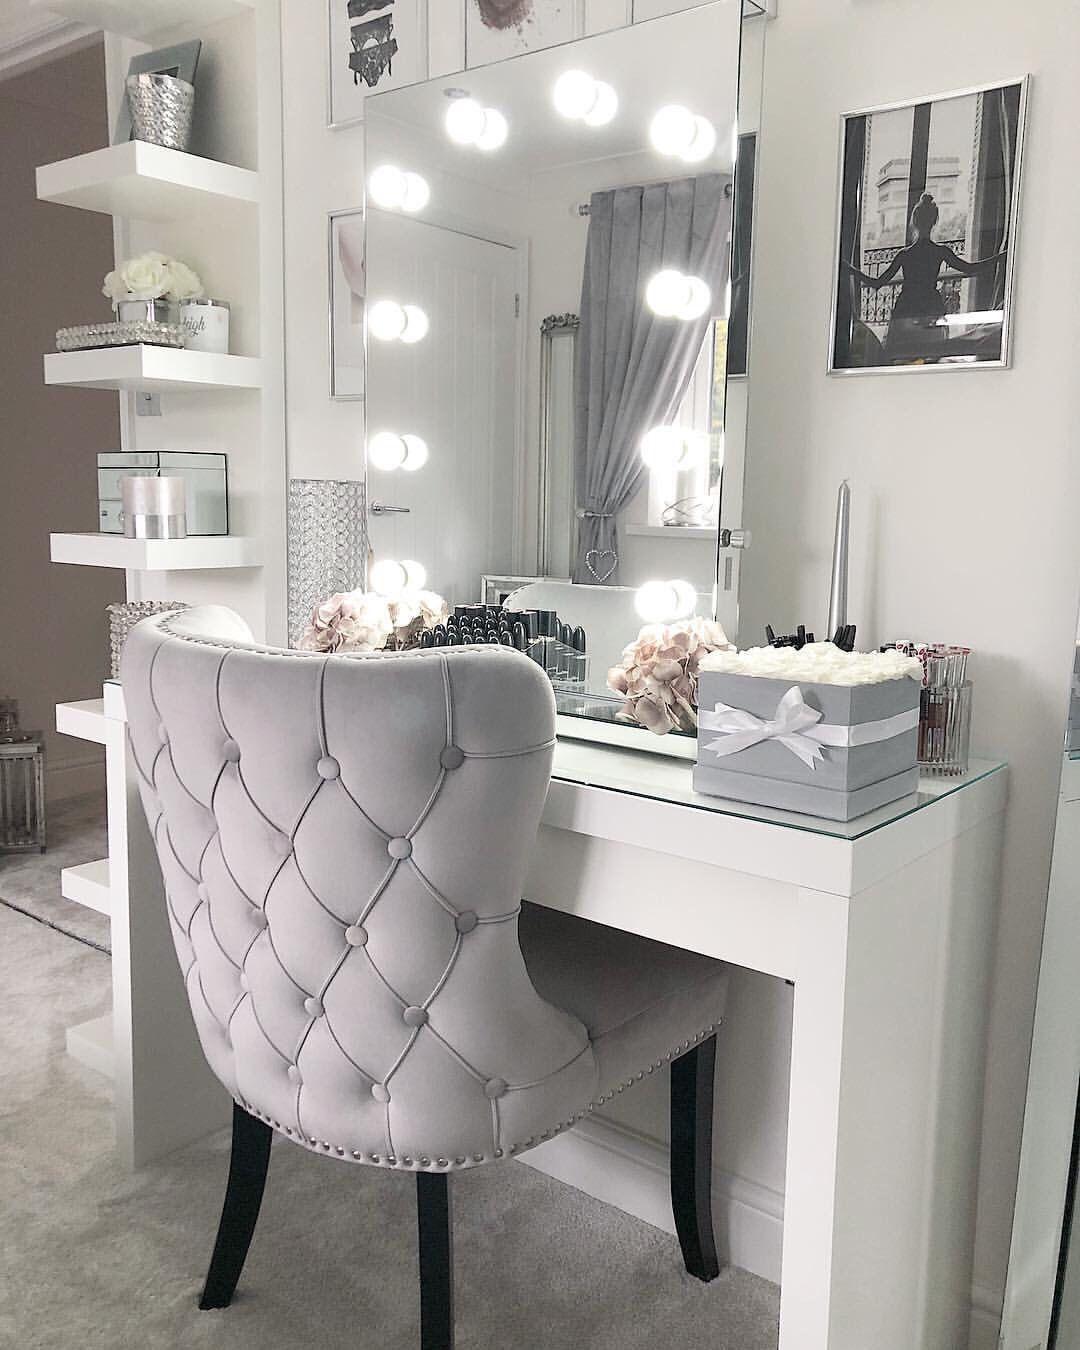 Best Vanity Mirror >> 20 Vanity Mirror With Lights Ideas Diy Or Buy For Amour Makeup